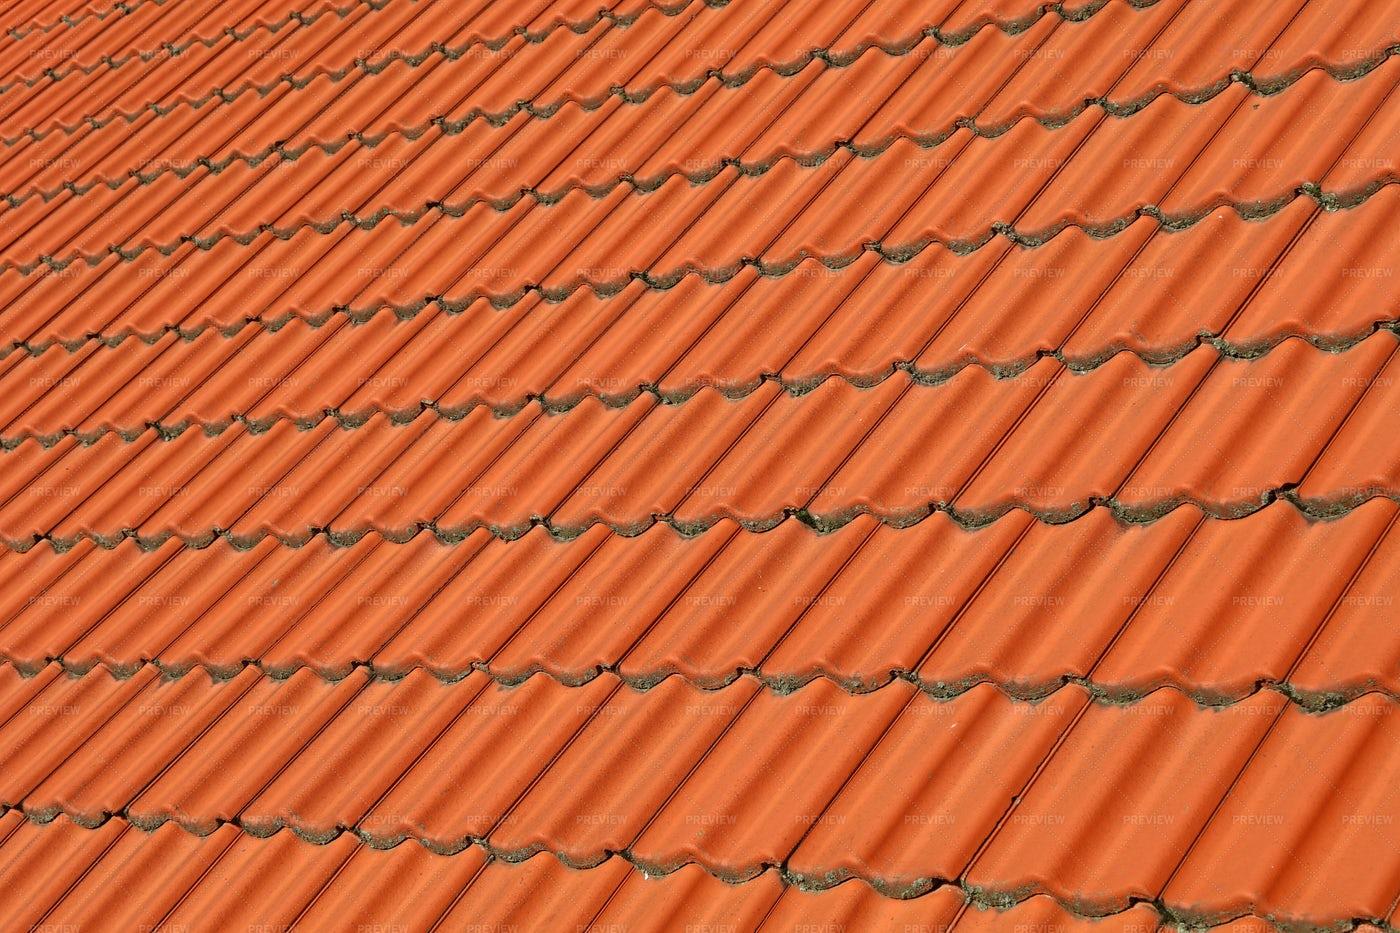 Ceramic Roof Tiles: Stock Photos